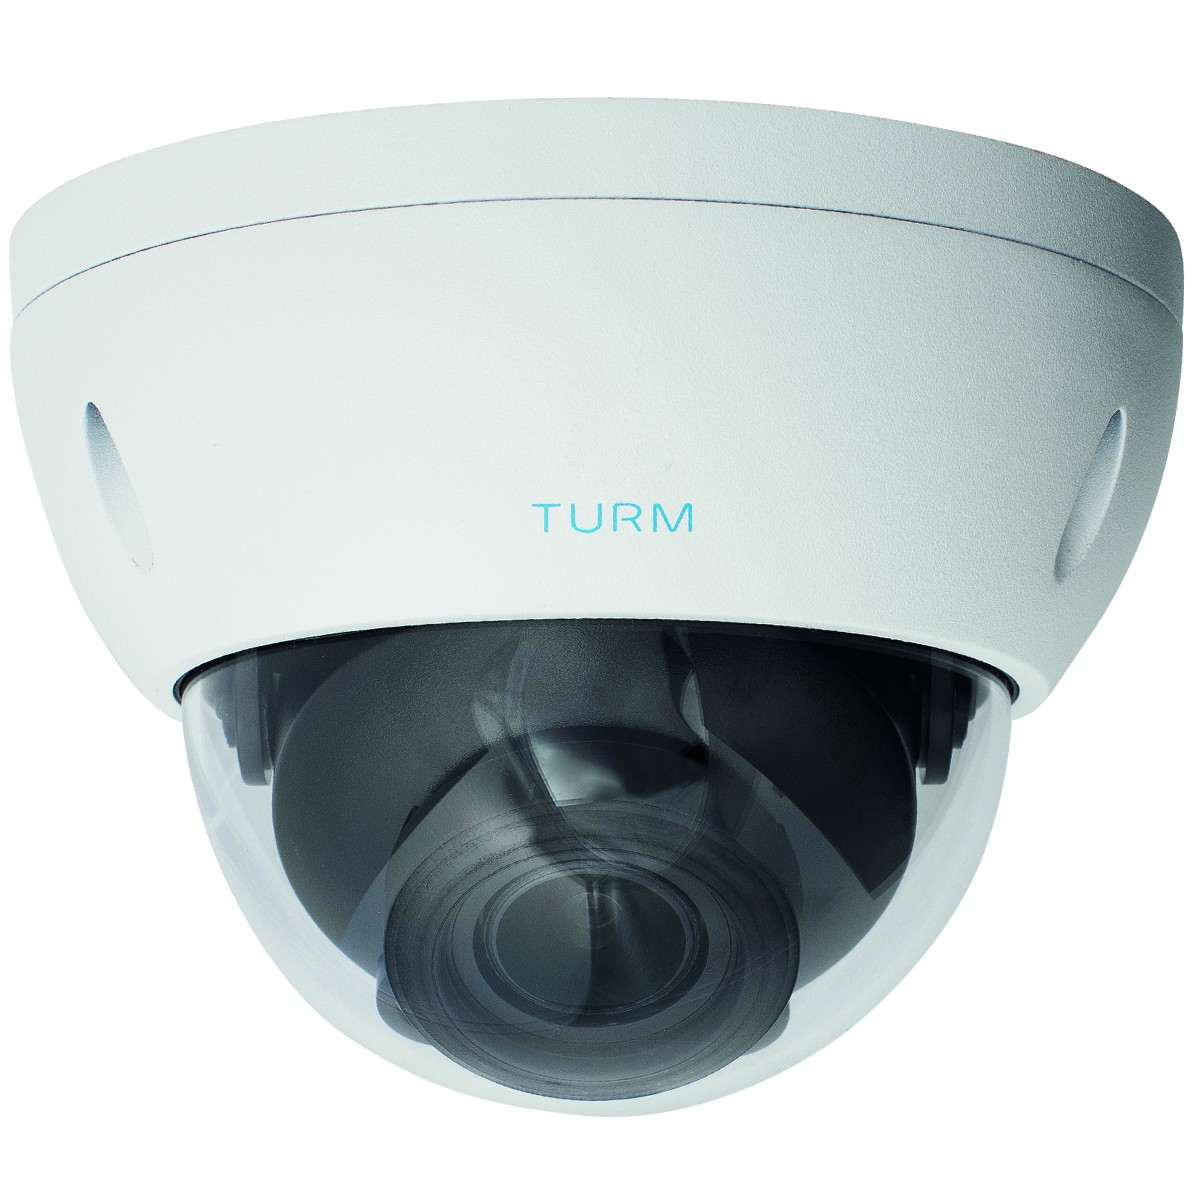 TURM HDCVI Professional 2MP Dome Kamera, 30m Nachtsicht mit Starlight, 2,7-13,5mm Motorzoom mit WDR